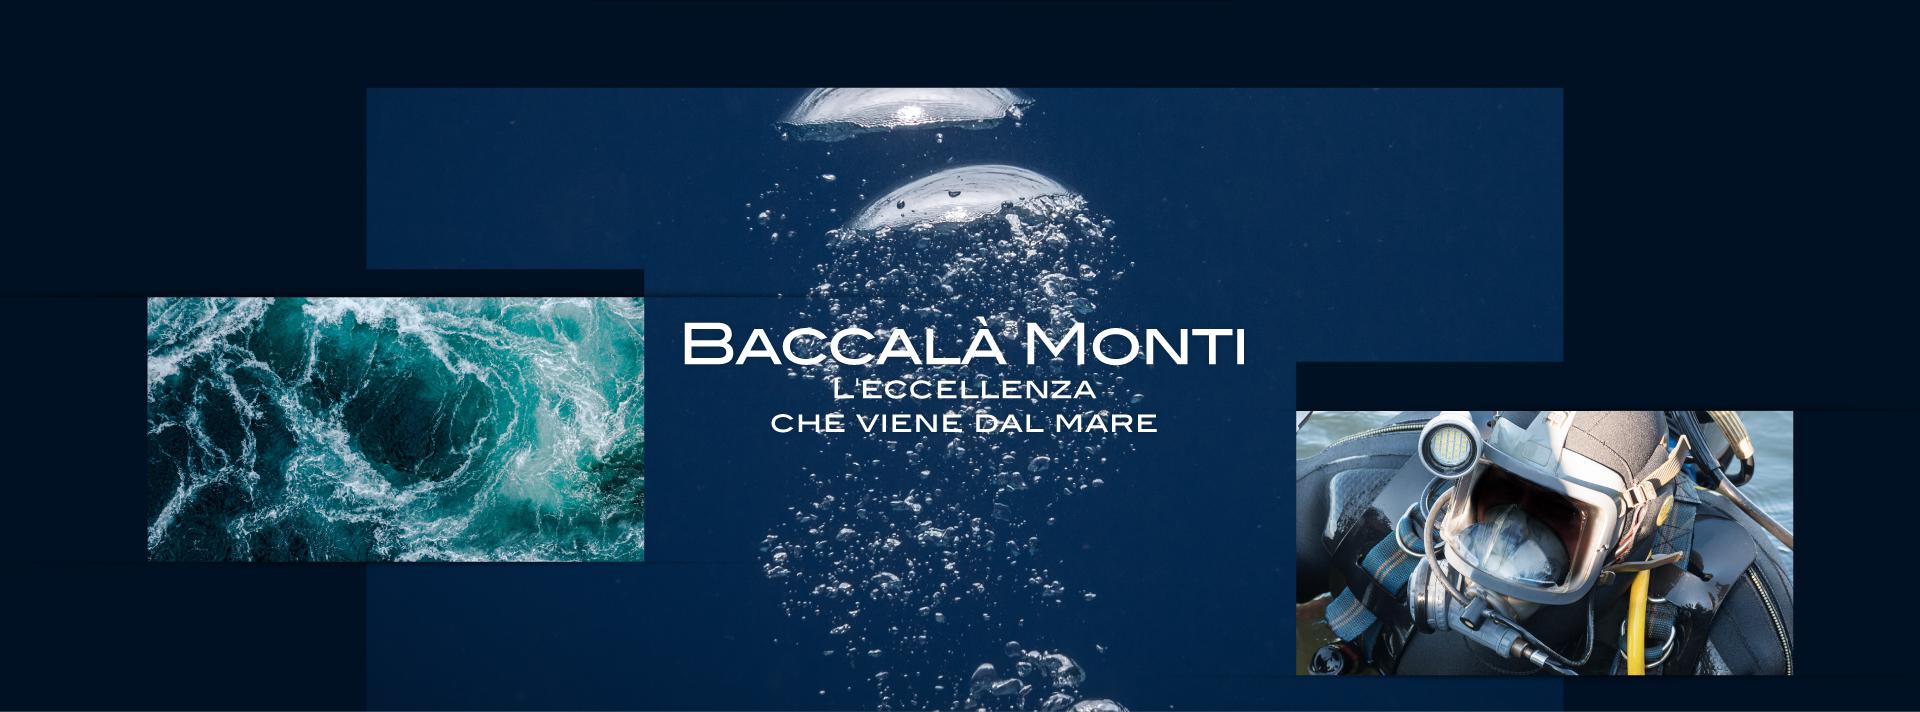 Baccalà Monti HPP-02